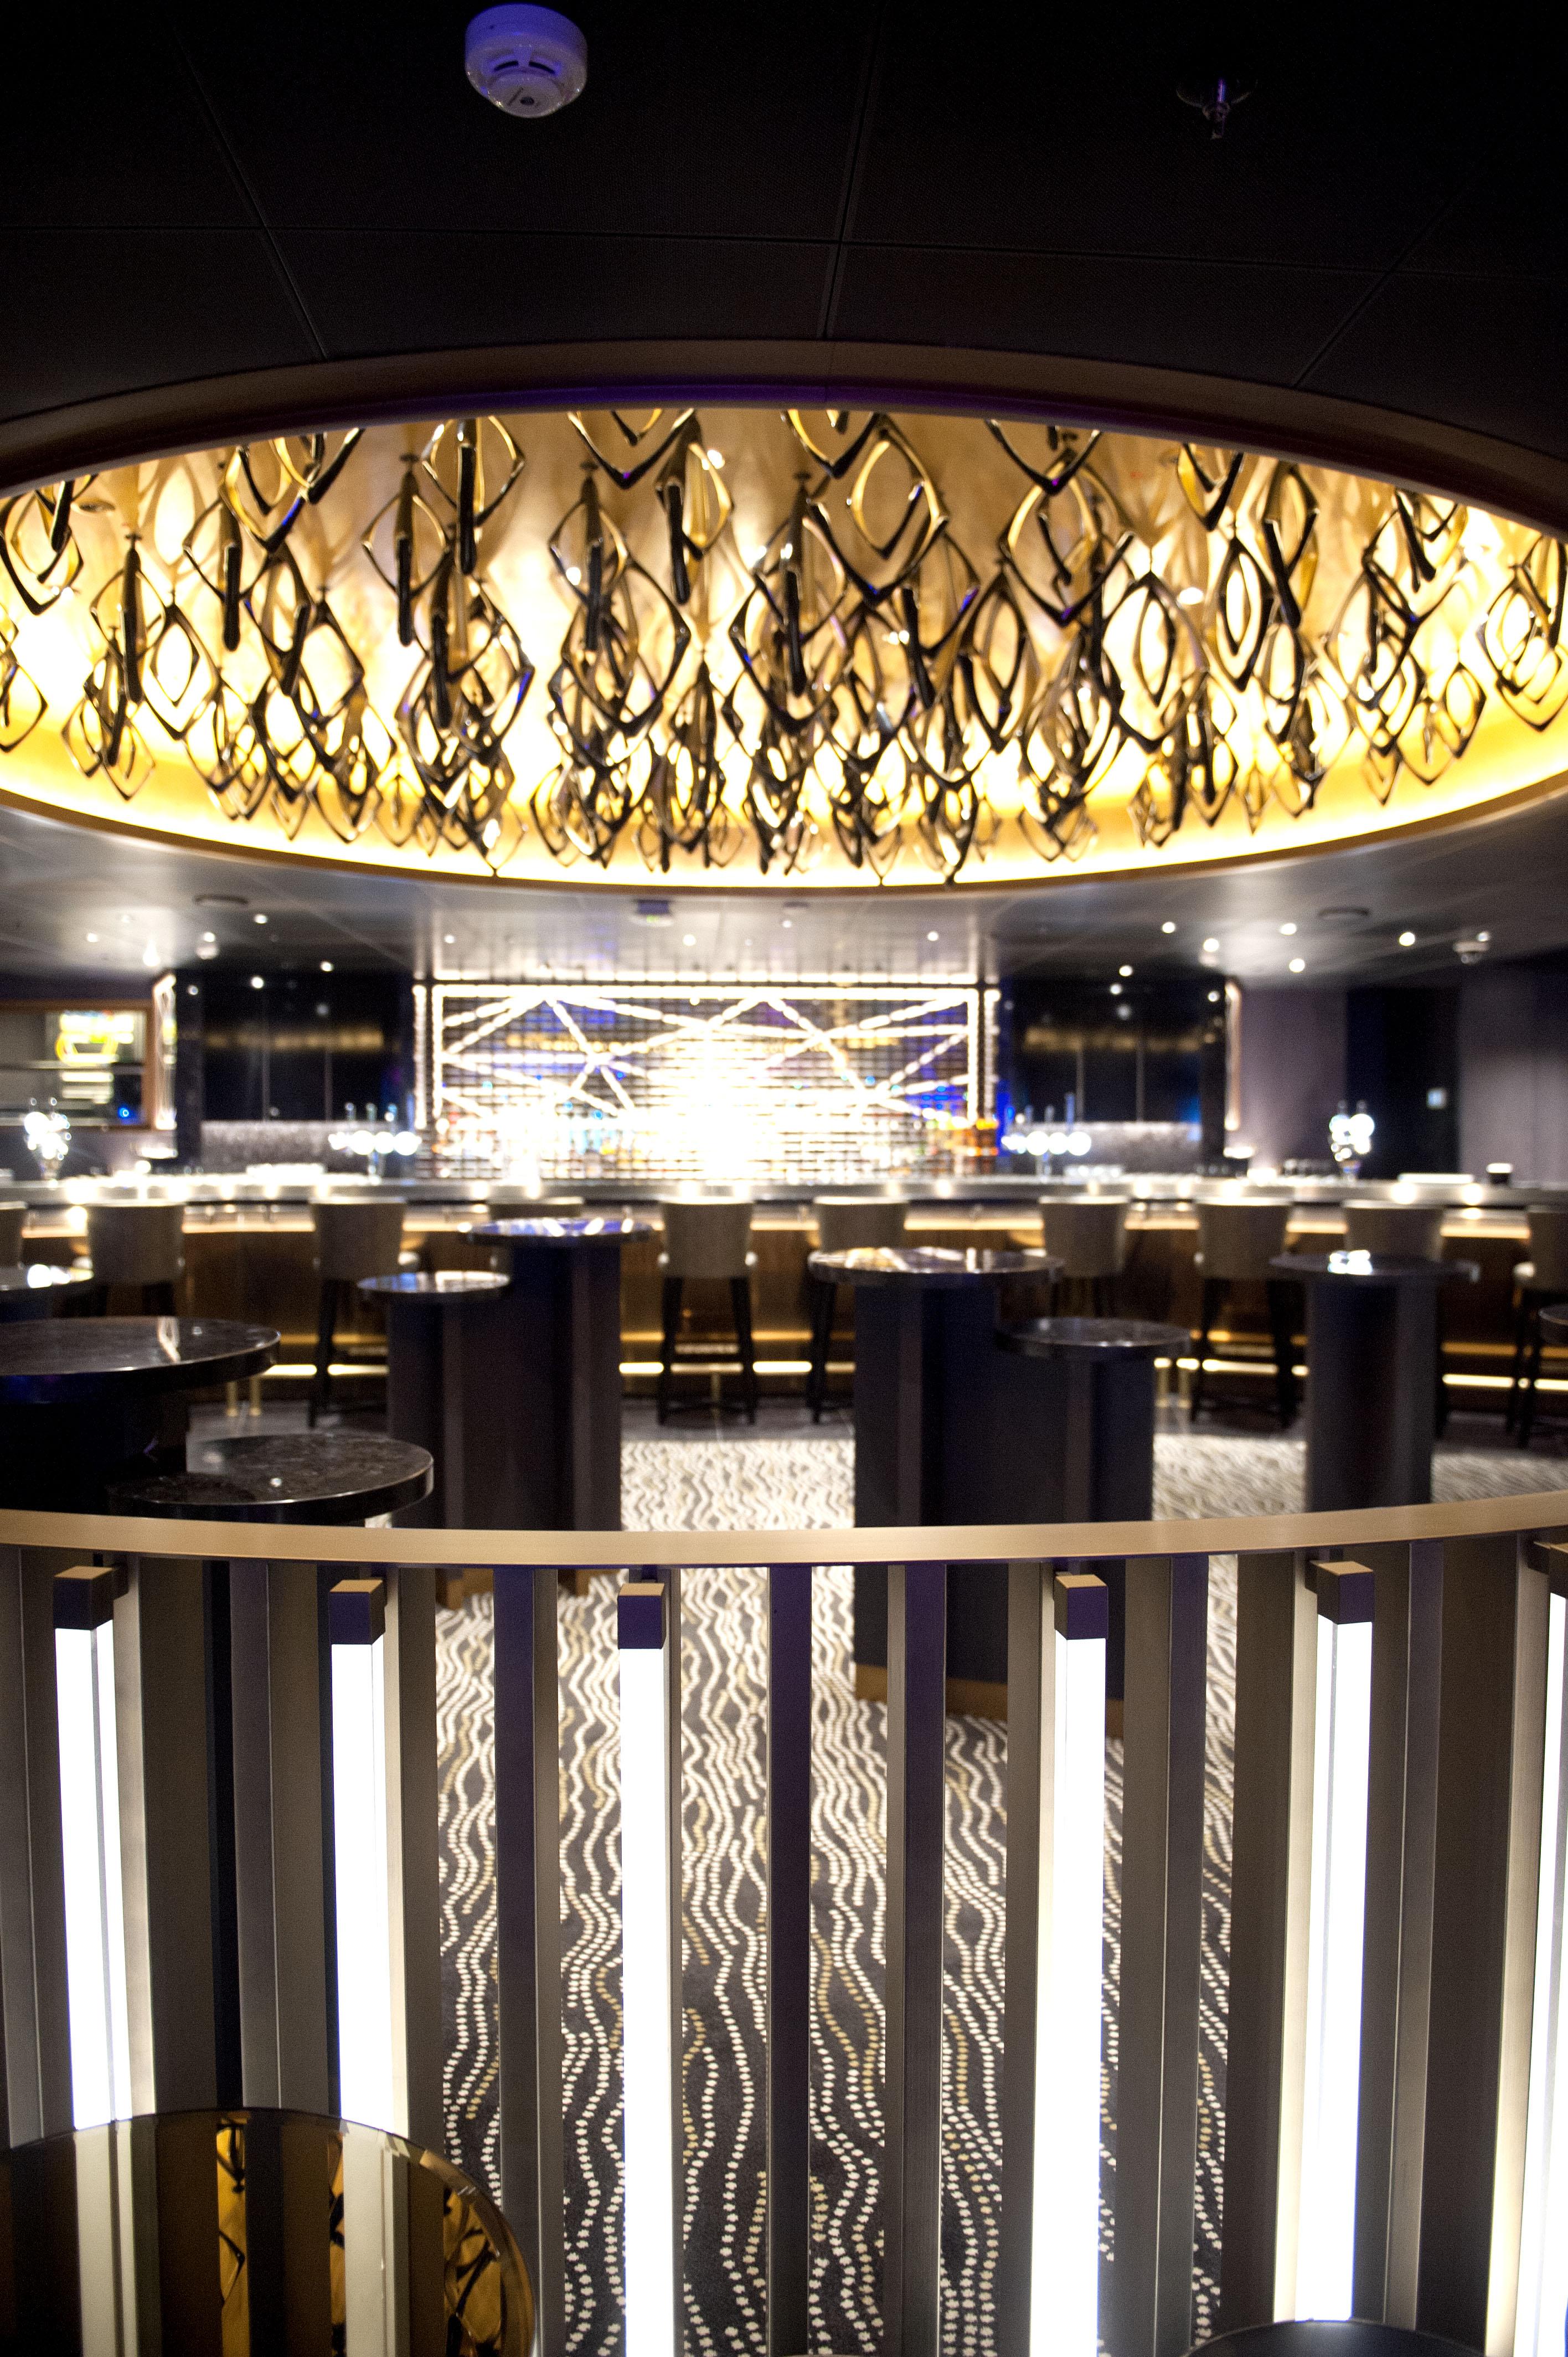 P&O Cruises Britannia Interior Live Lounge Nd32724.jpg